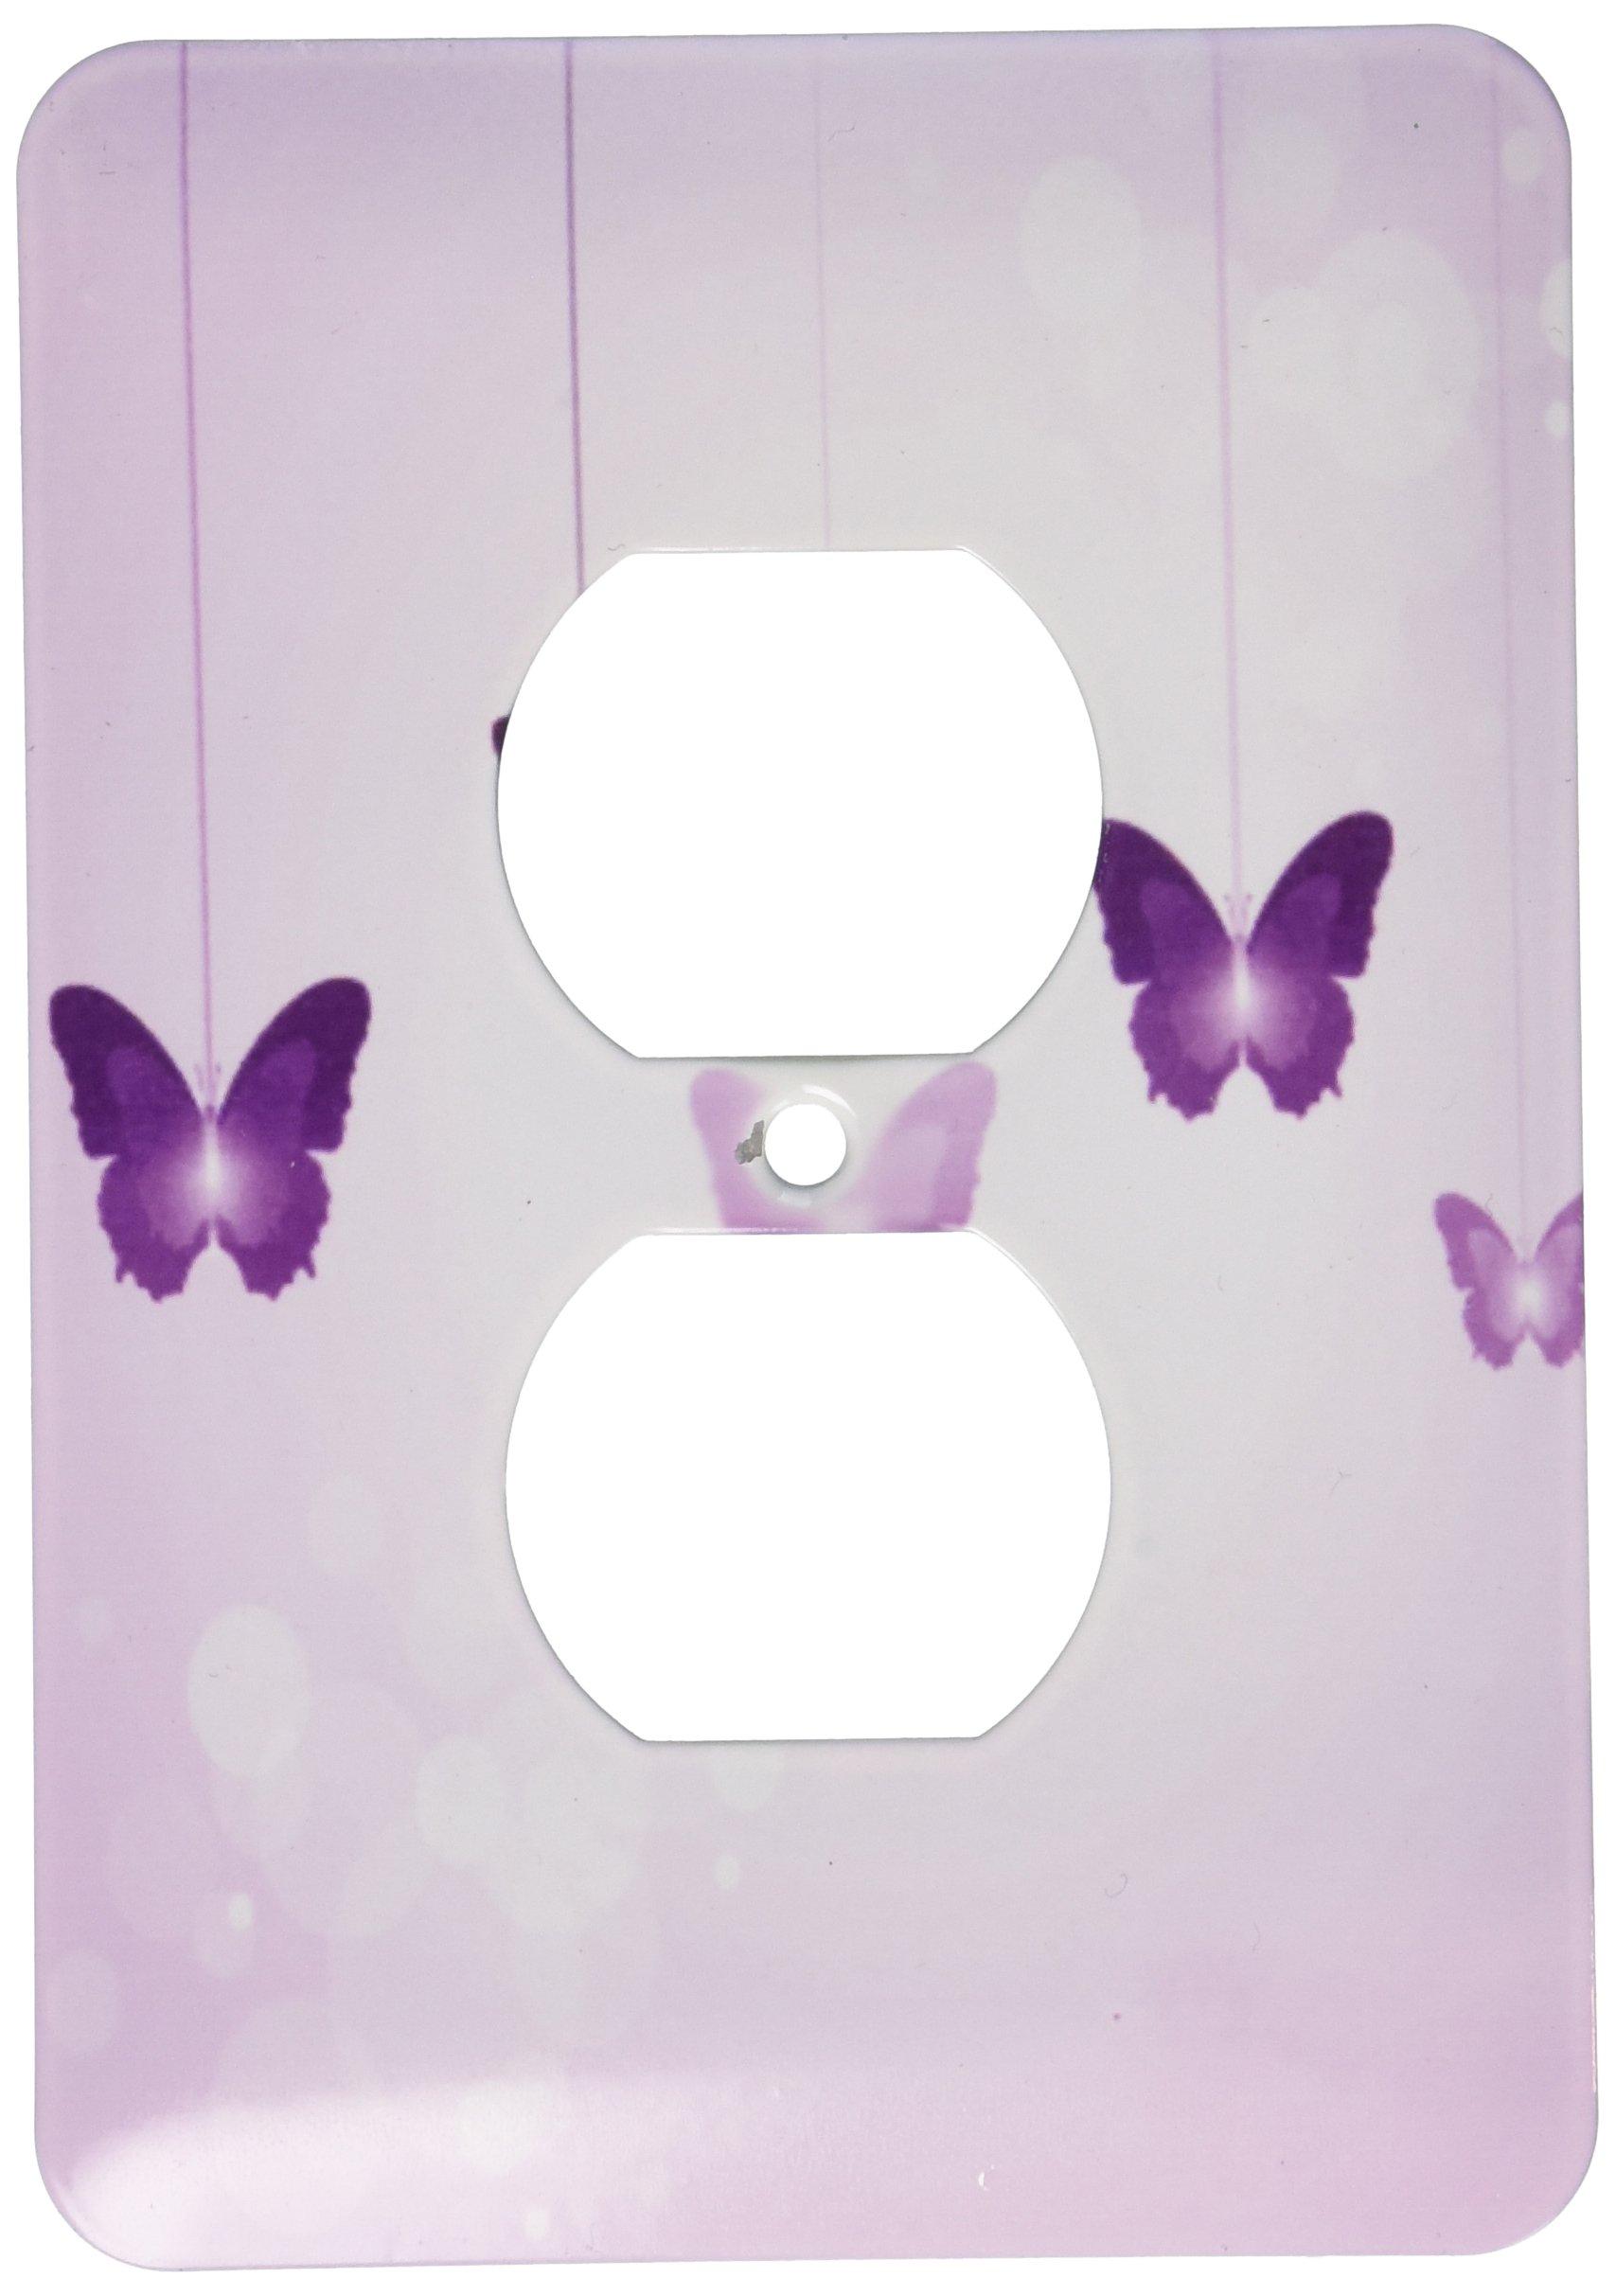 3dRose lsp_78670_6 Cute Dark And Light Purple Dangling Butterflies - 2 Plug Outlet Cover